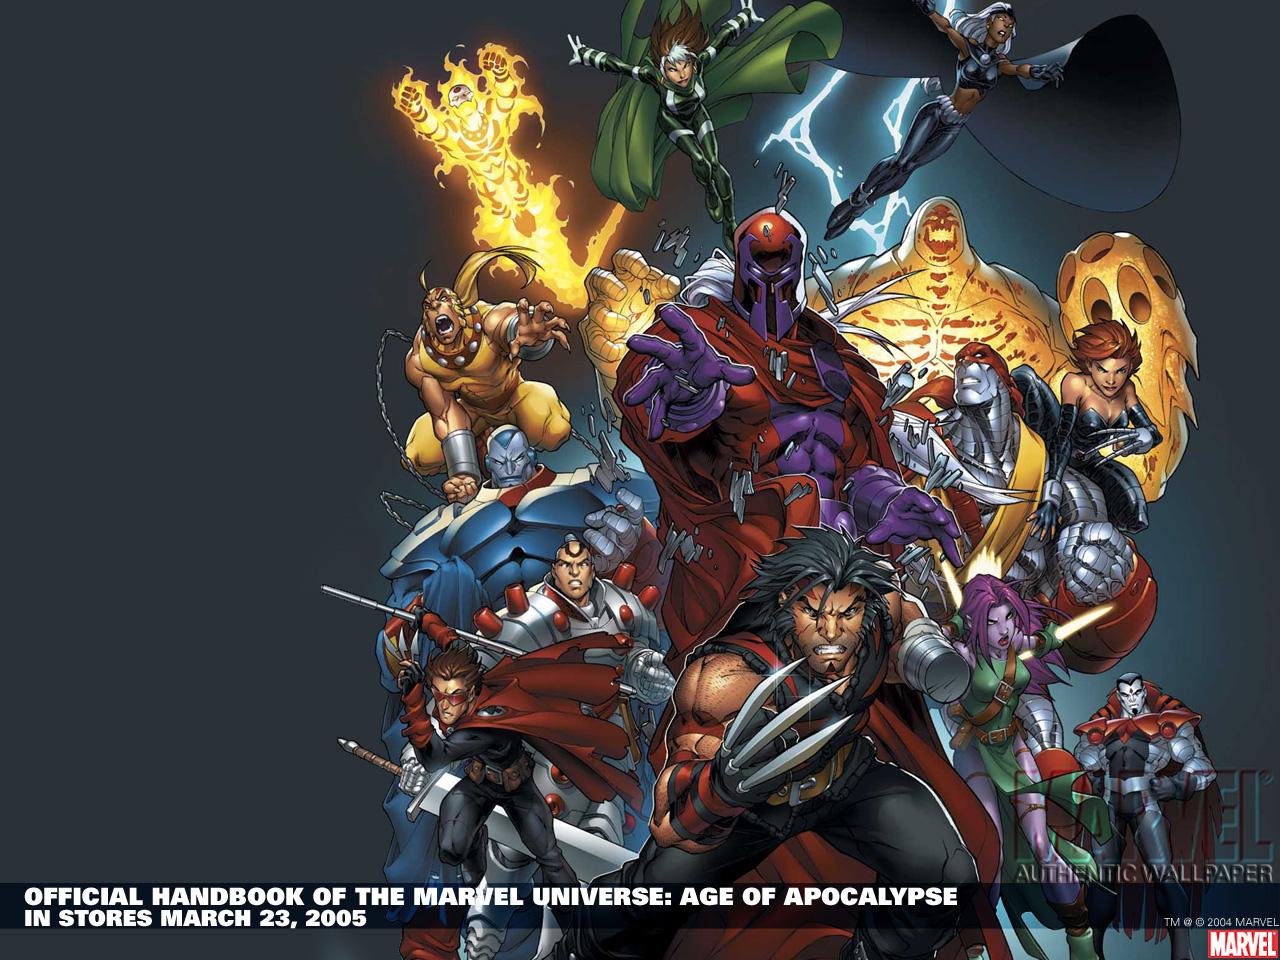 Marvel hd wallpaper techmynd 92 500x375 100 Marvel Super Heroes HD 1280x960